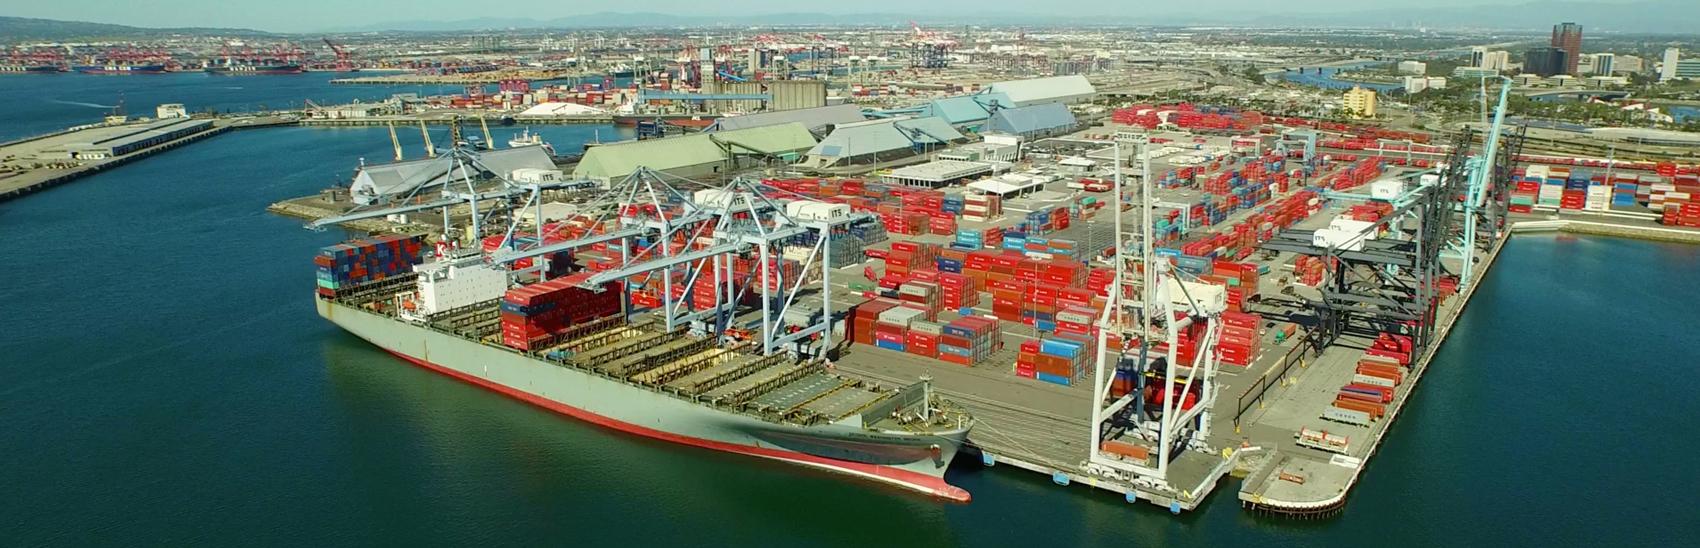 Logistics Australia, International Freight, Freight Logistics Sydney, Melbourne, Brisbane, Darwin, Adelaide, Perth, Hobart